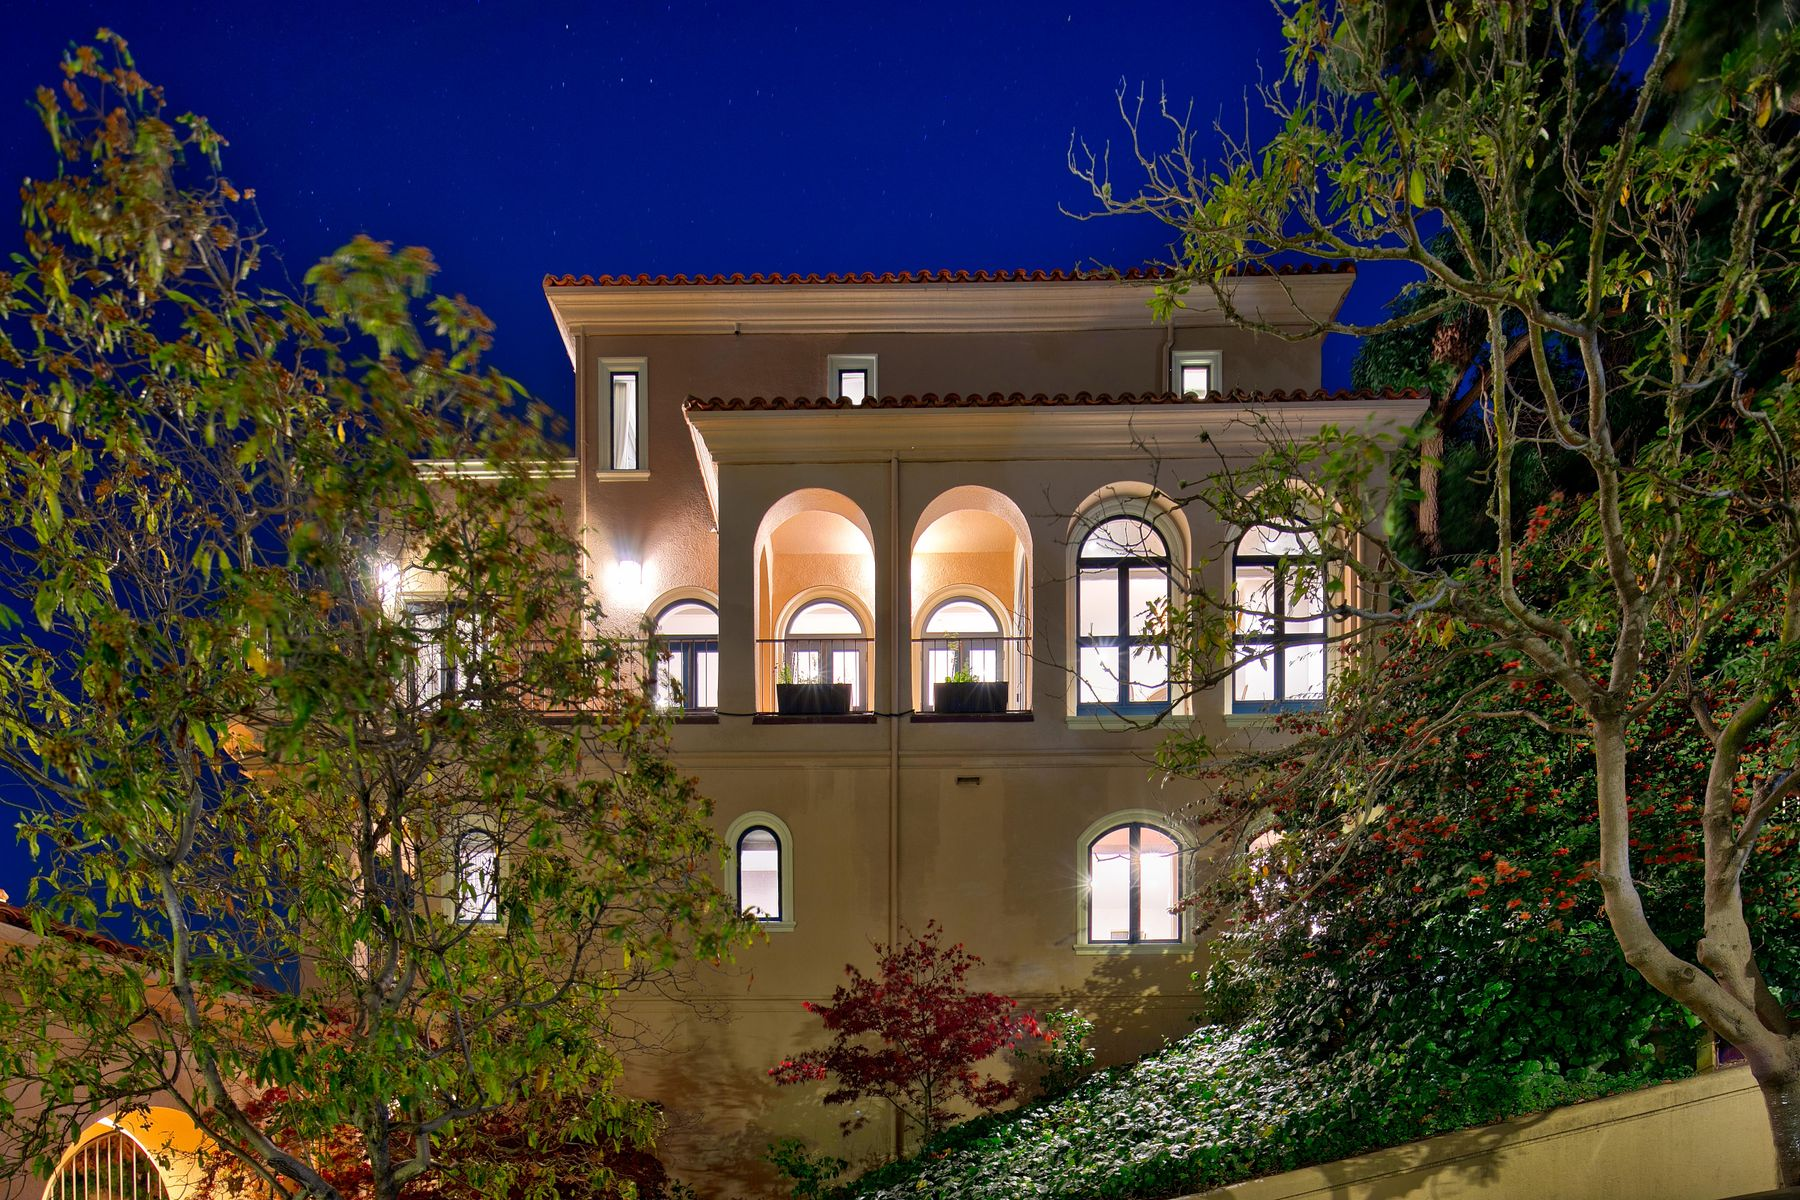 Condominiums 为 销售 在 View home on iconic Telegraph Hill 1960 Grant Ave Apt 15 旧金山, 加利福尼亚州 94133 美国